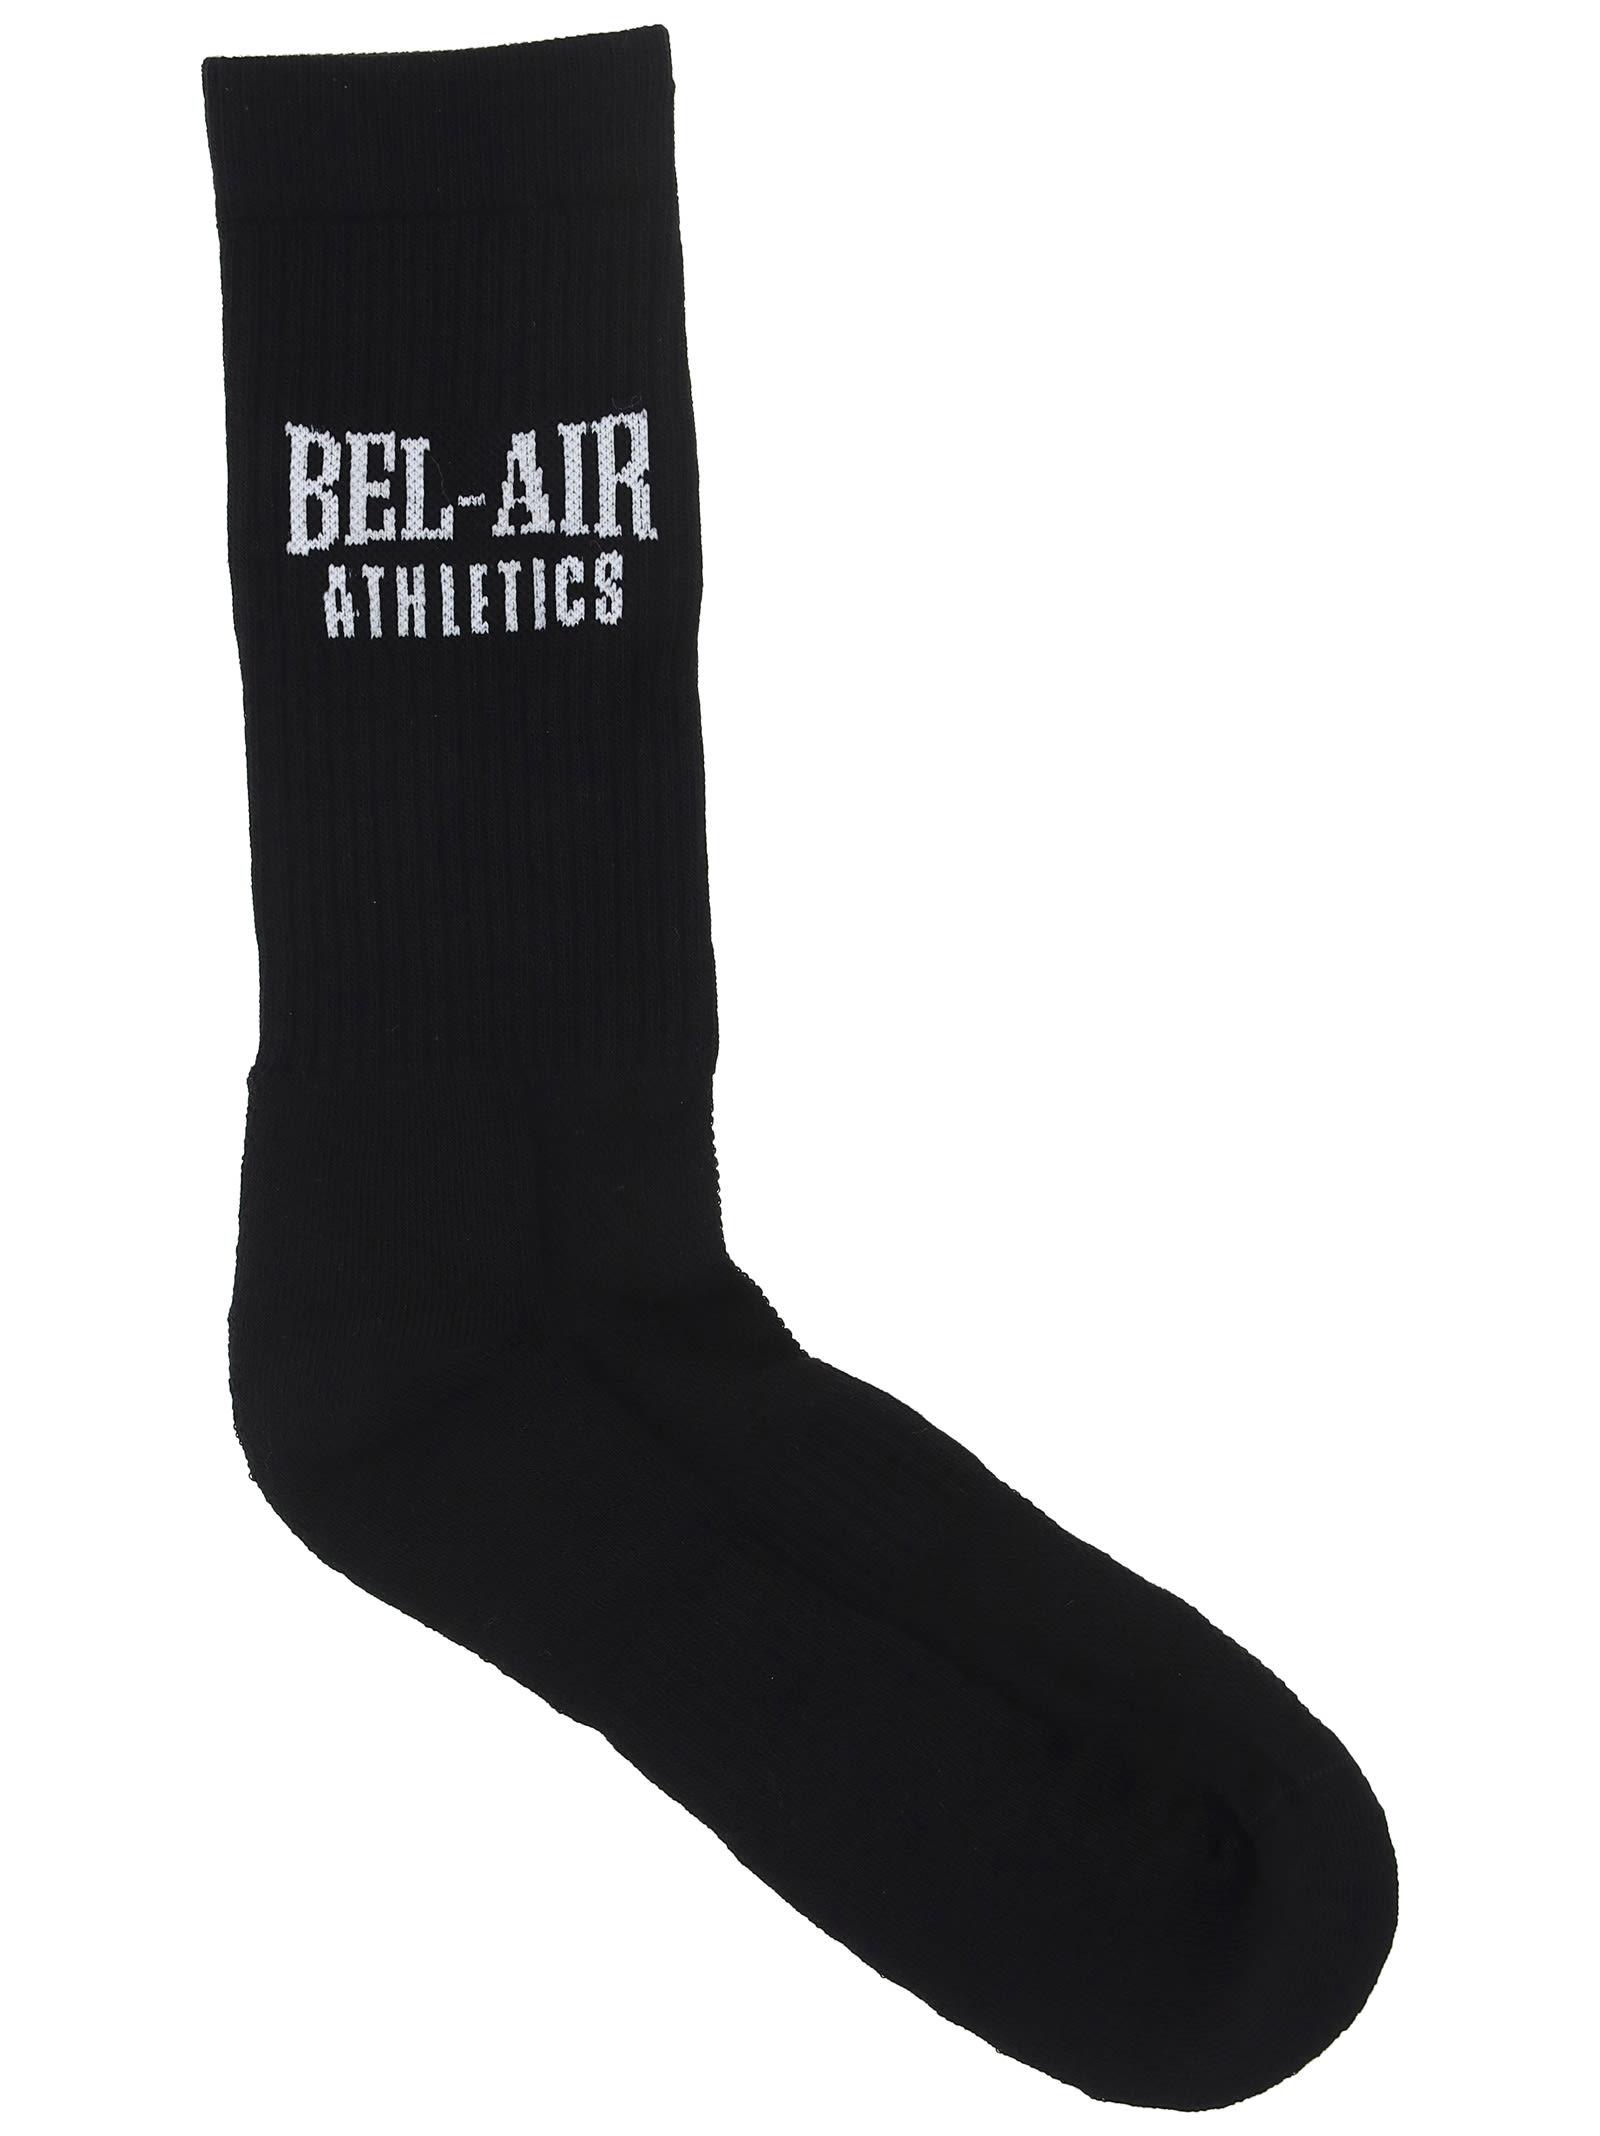 Bel Air Athletics Socks